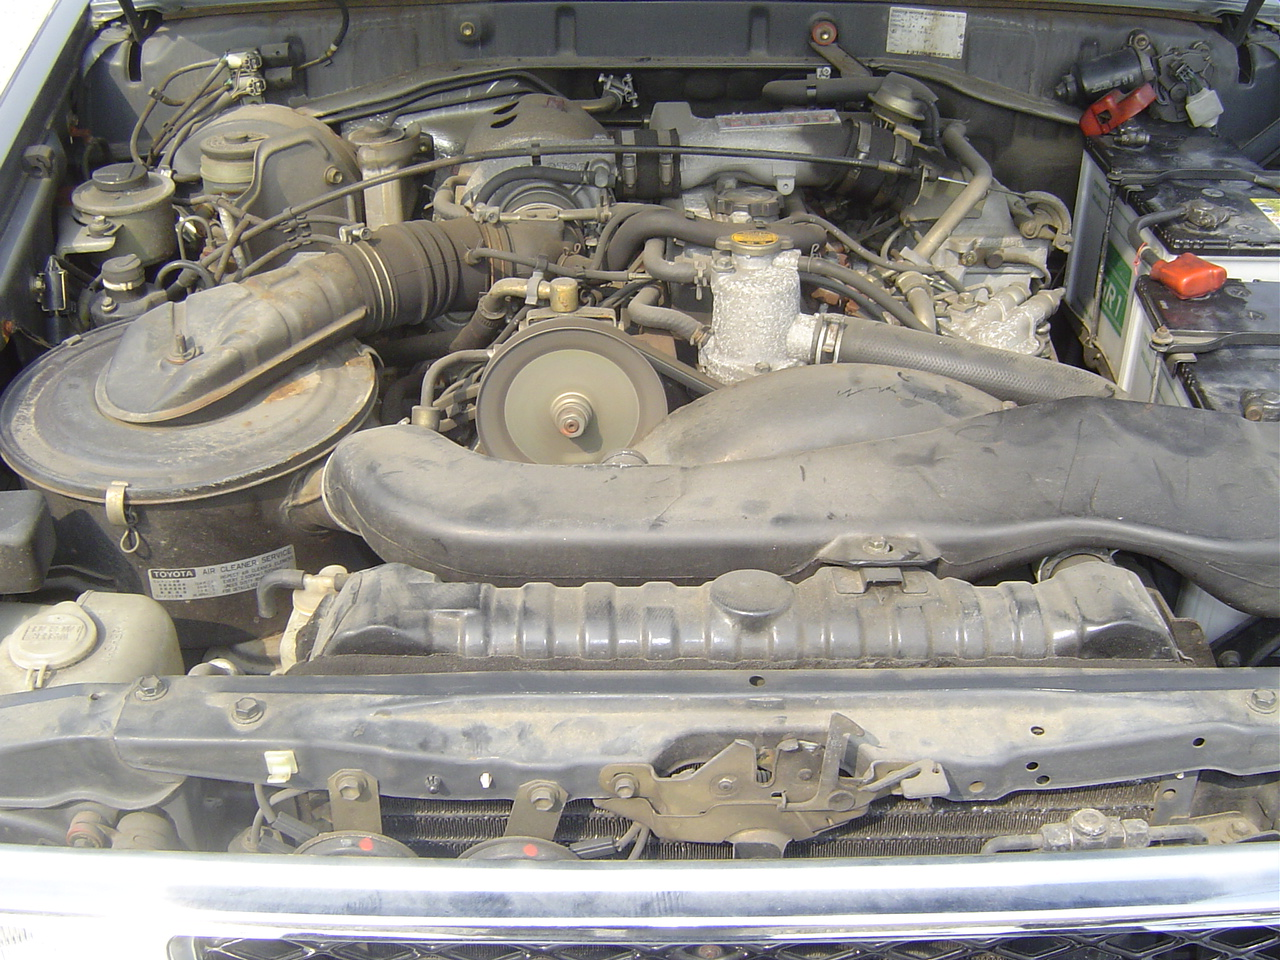 1989 Toyota Landcruiser BJ74 4WD engine